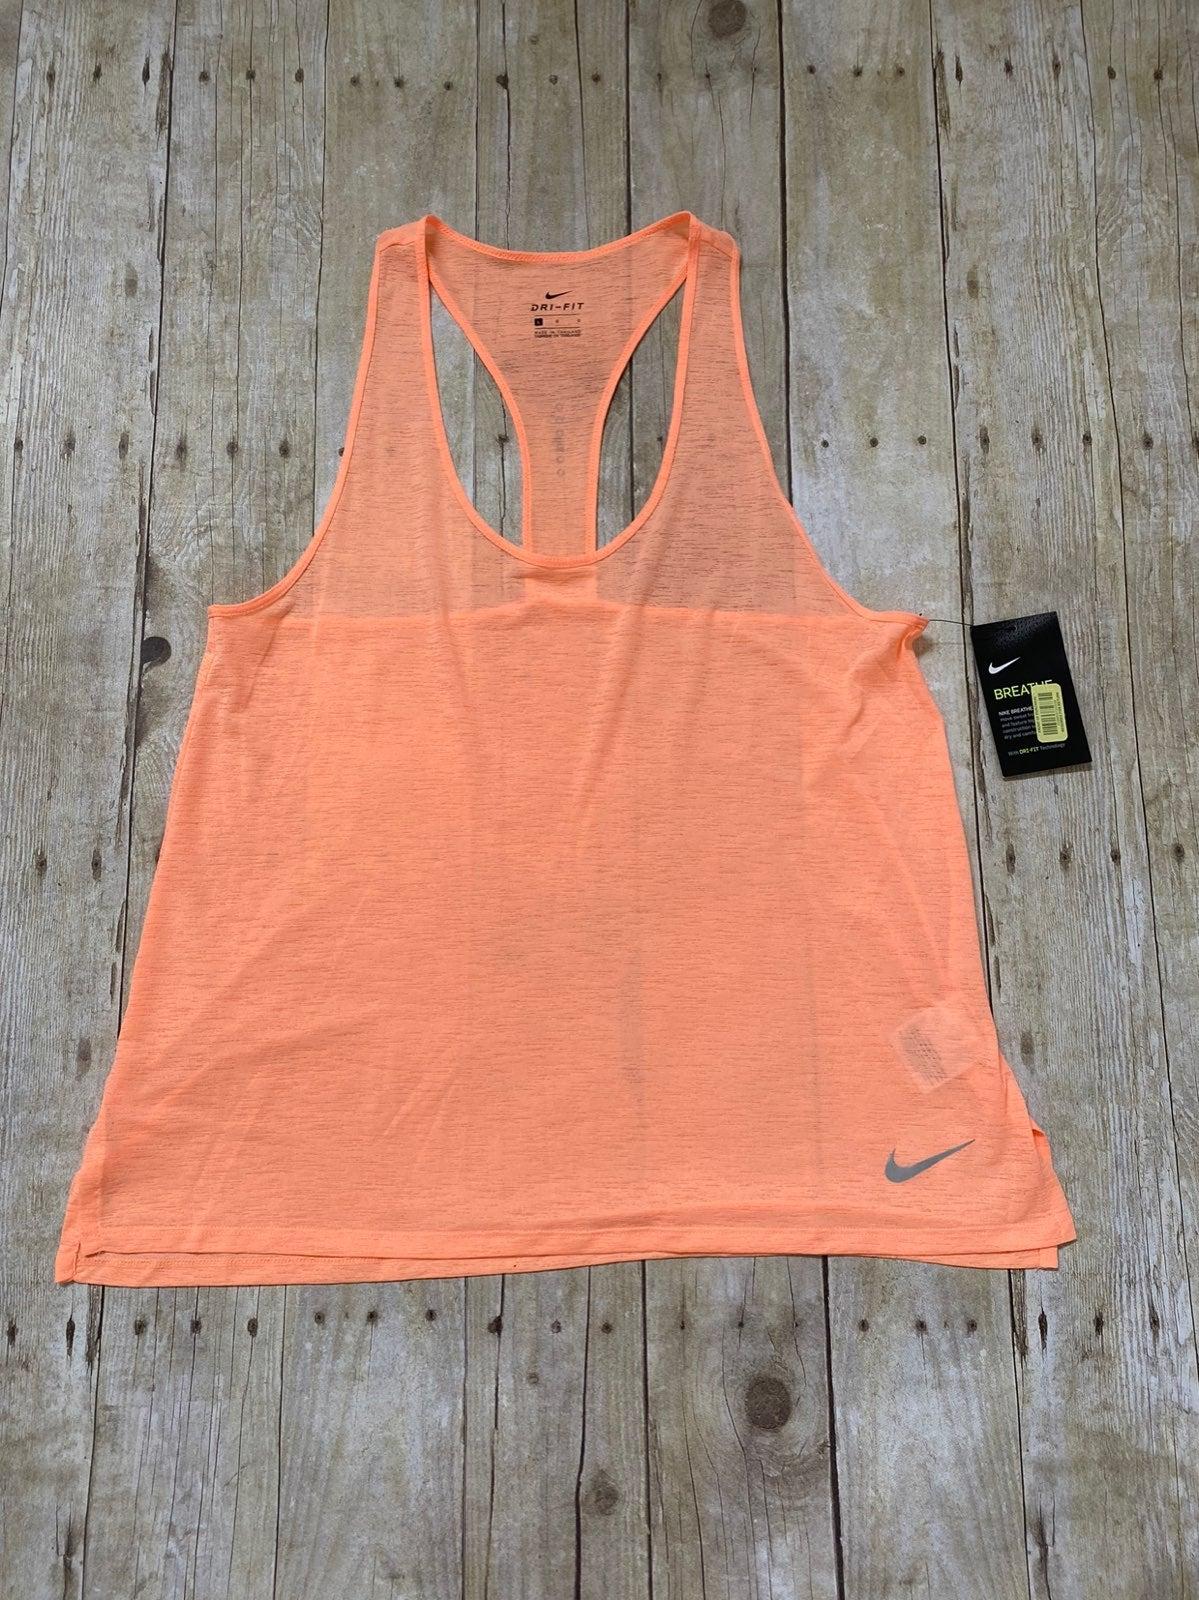 Nike Burnout Tank Size Large